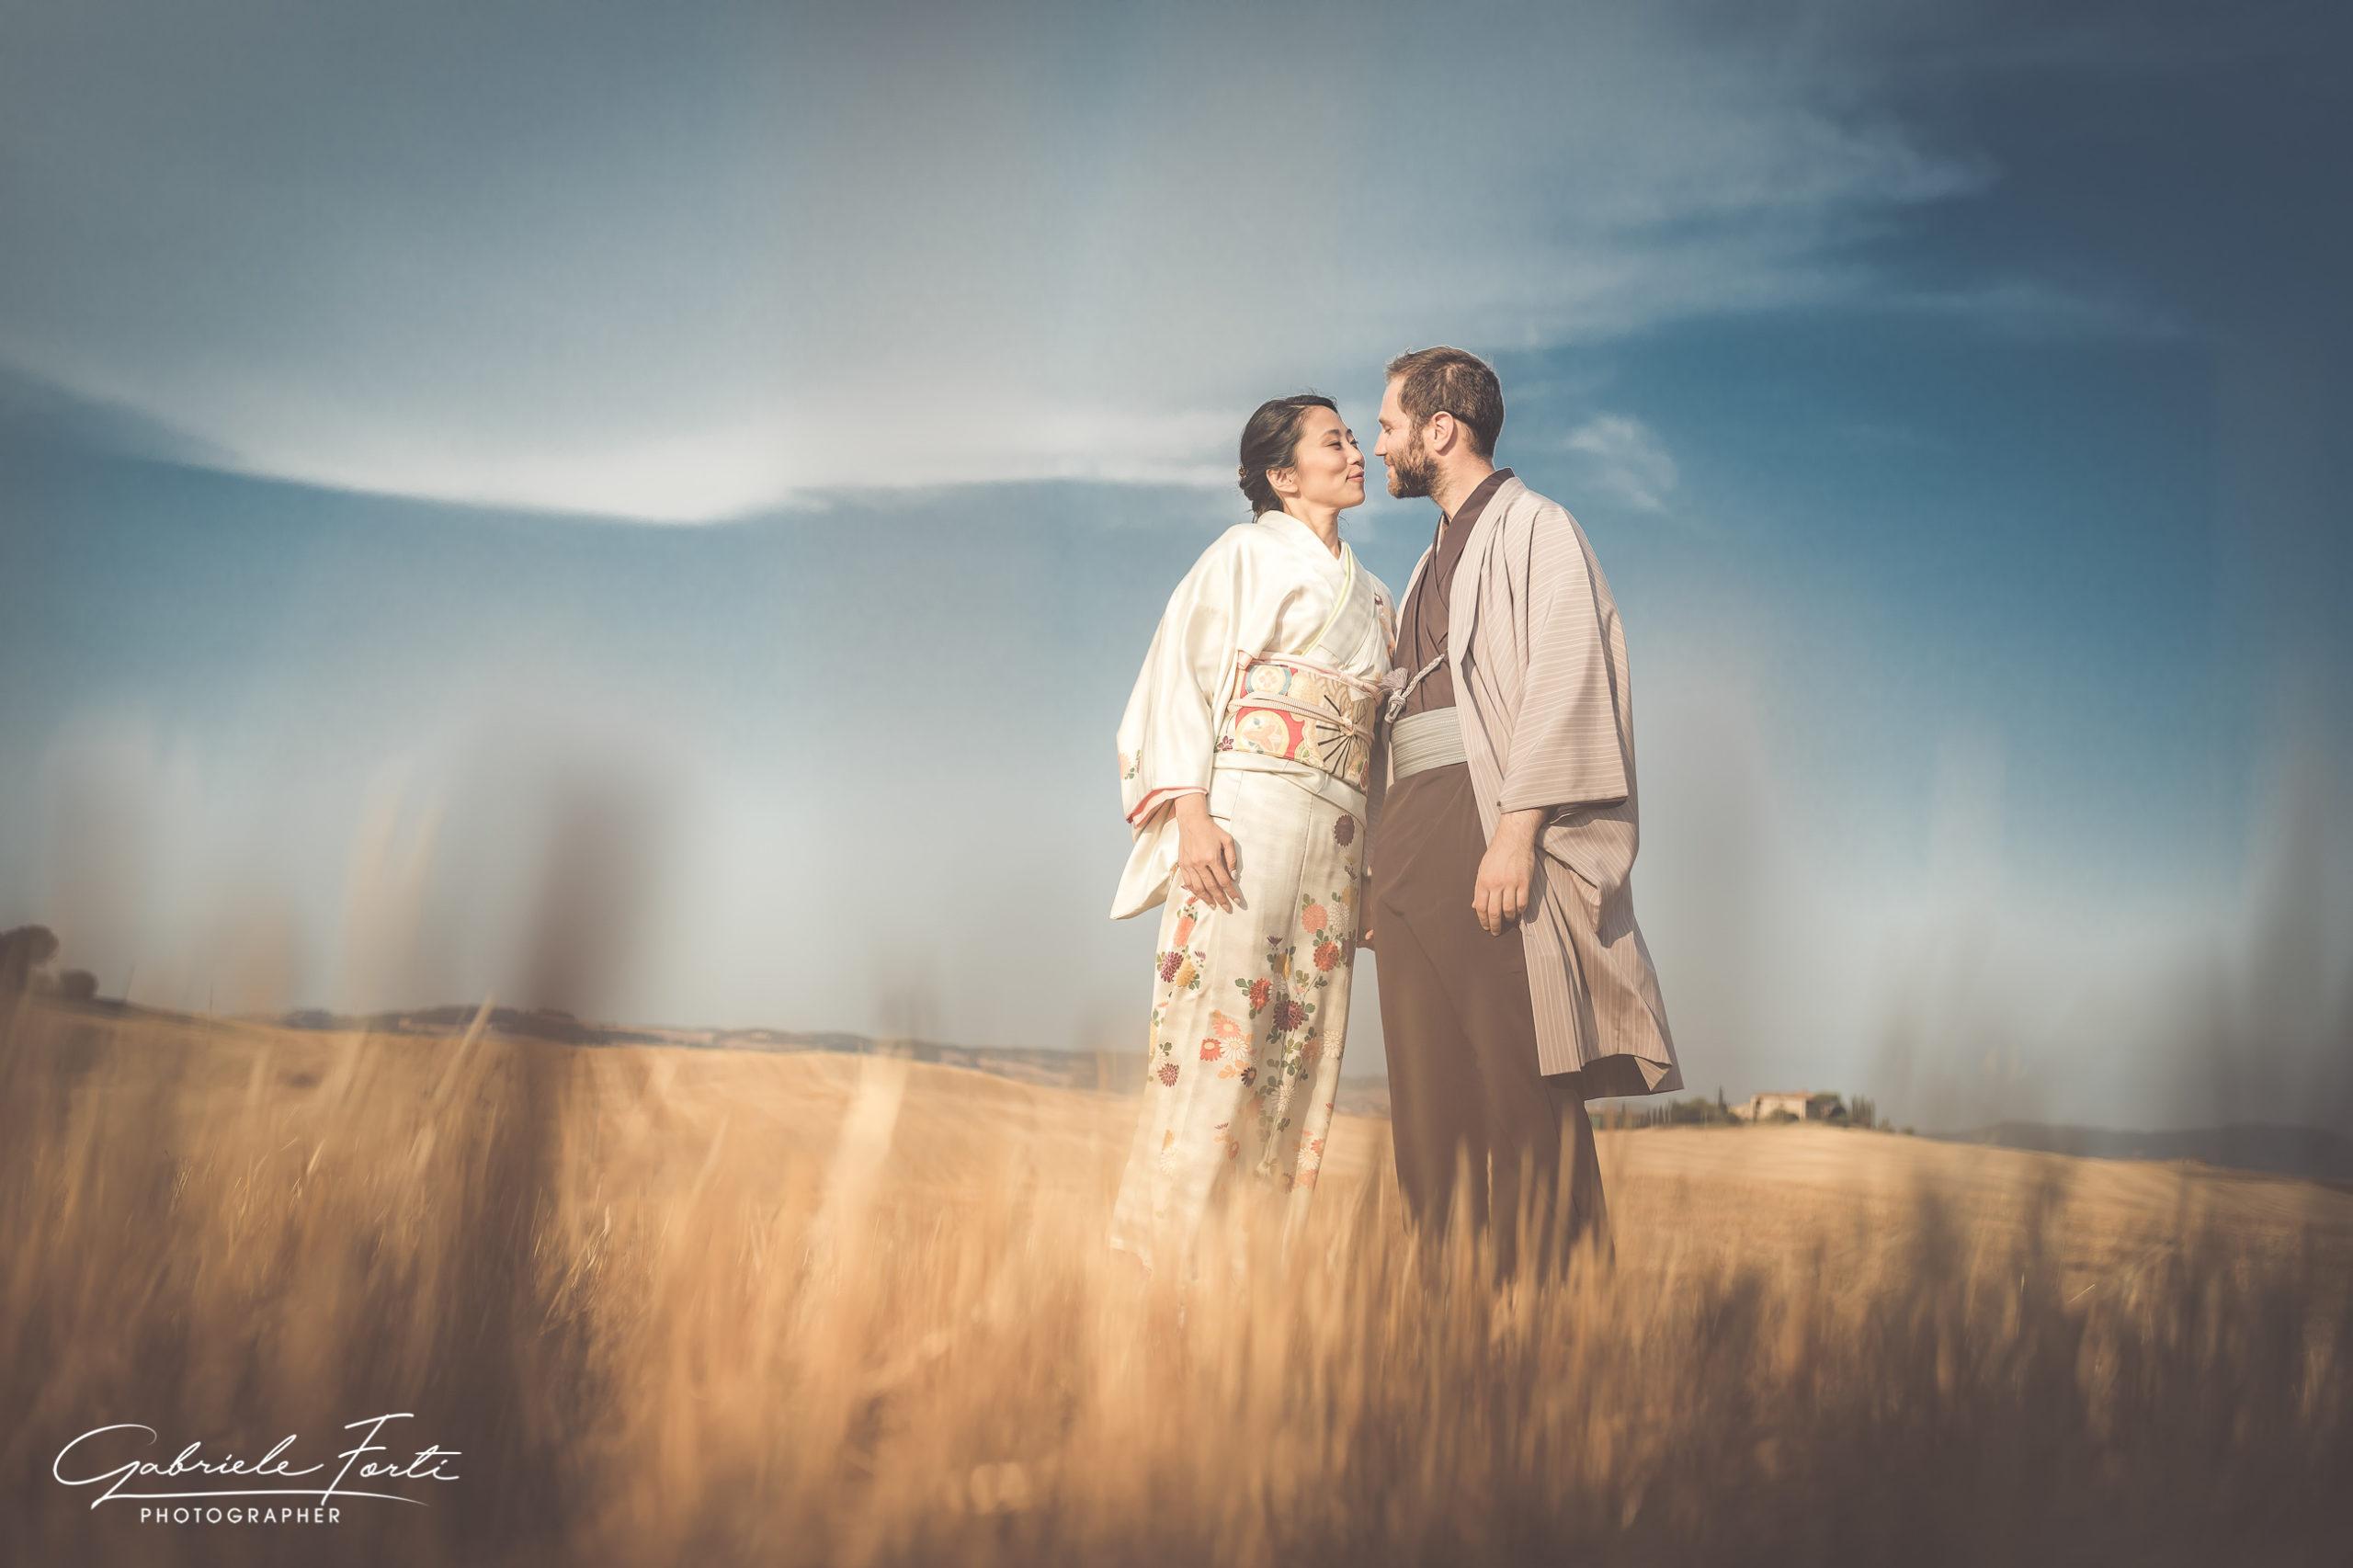 wedding-japan-tuscany-locanda-in-tuscany-photographer-siena-foto-forti-gabriele-1